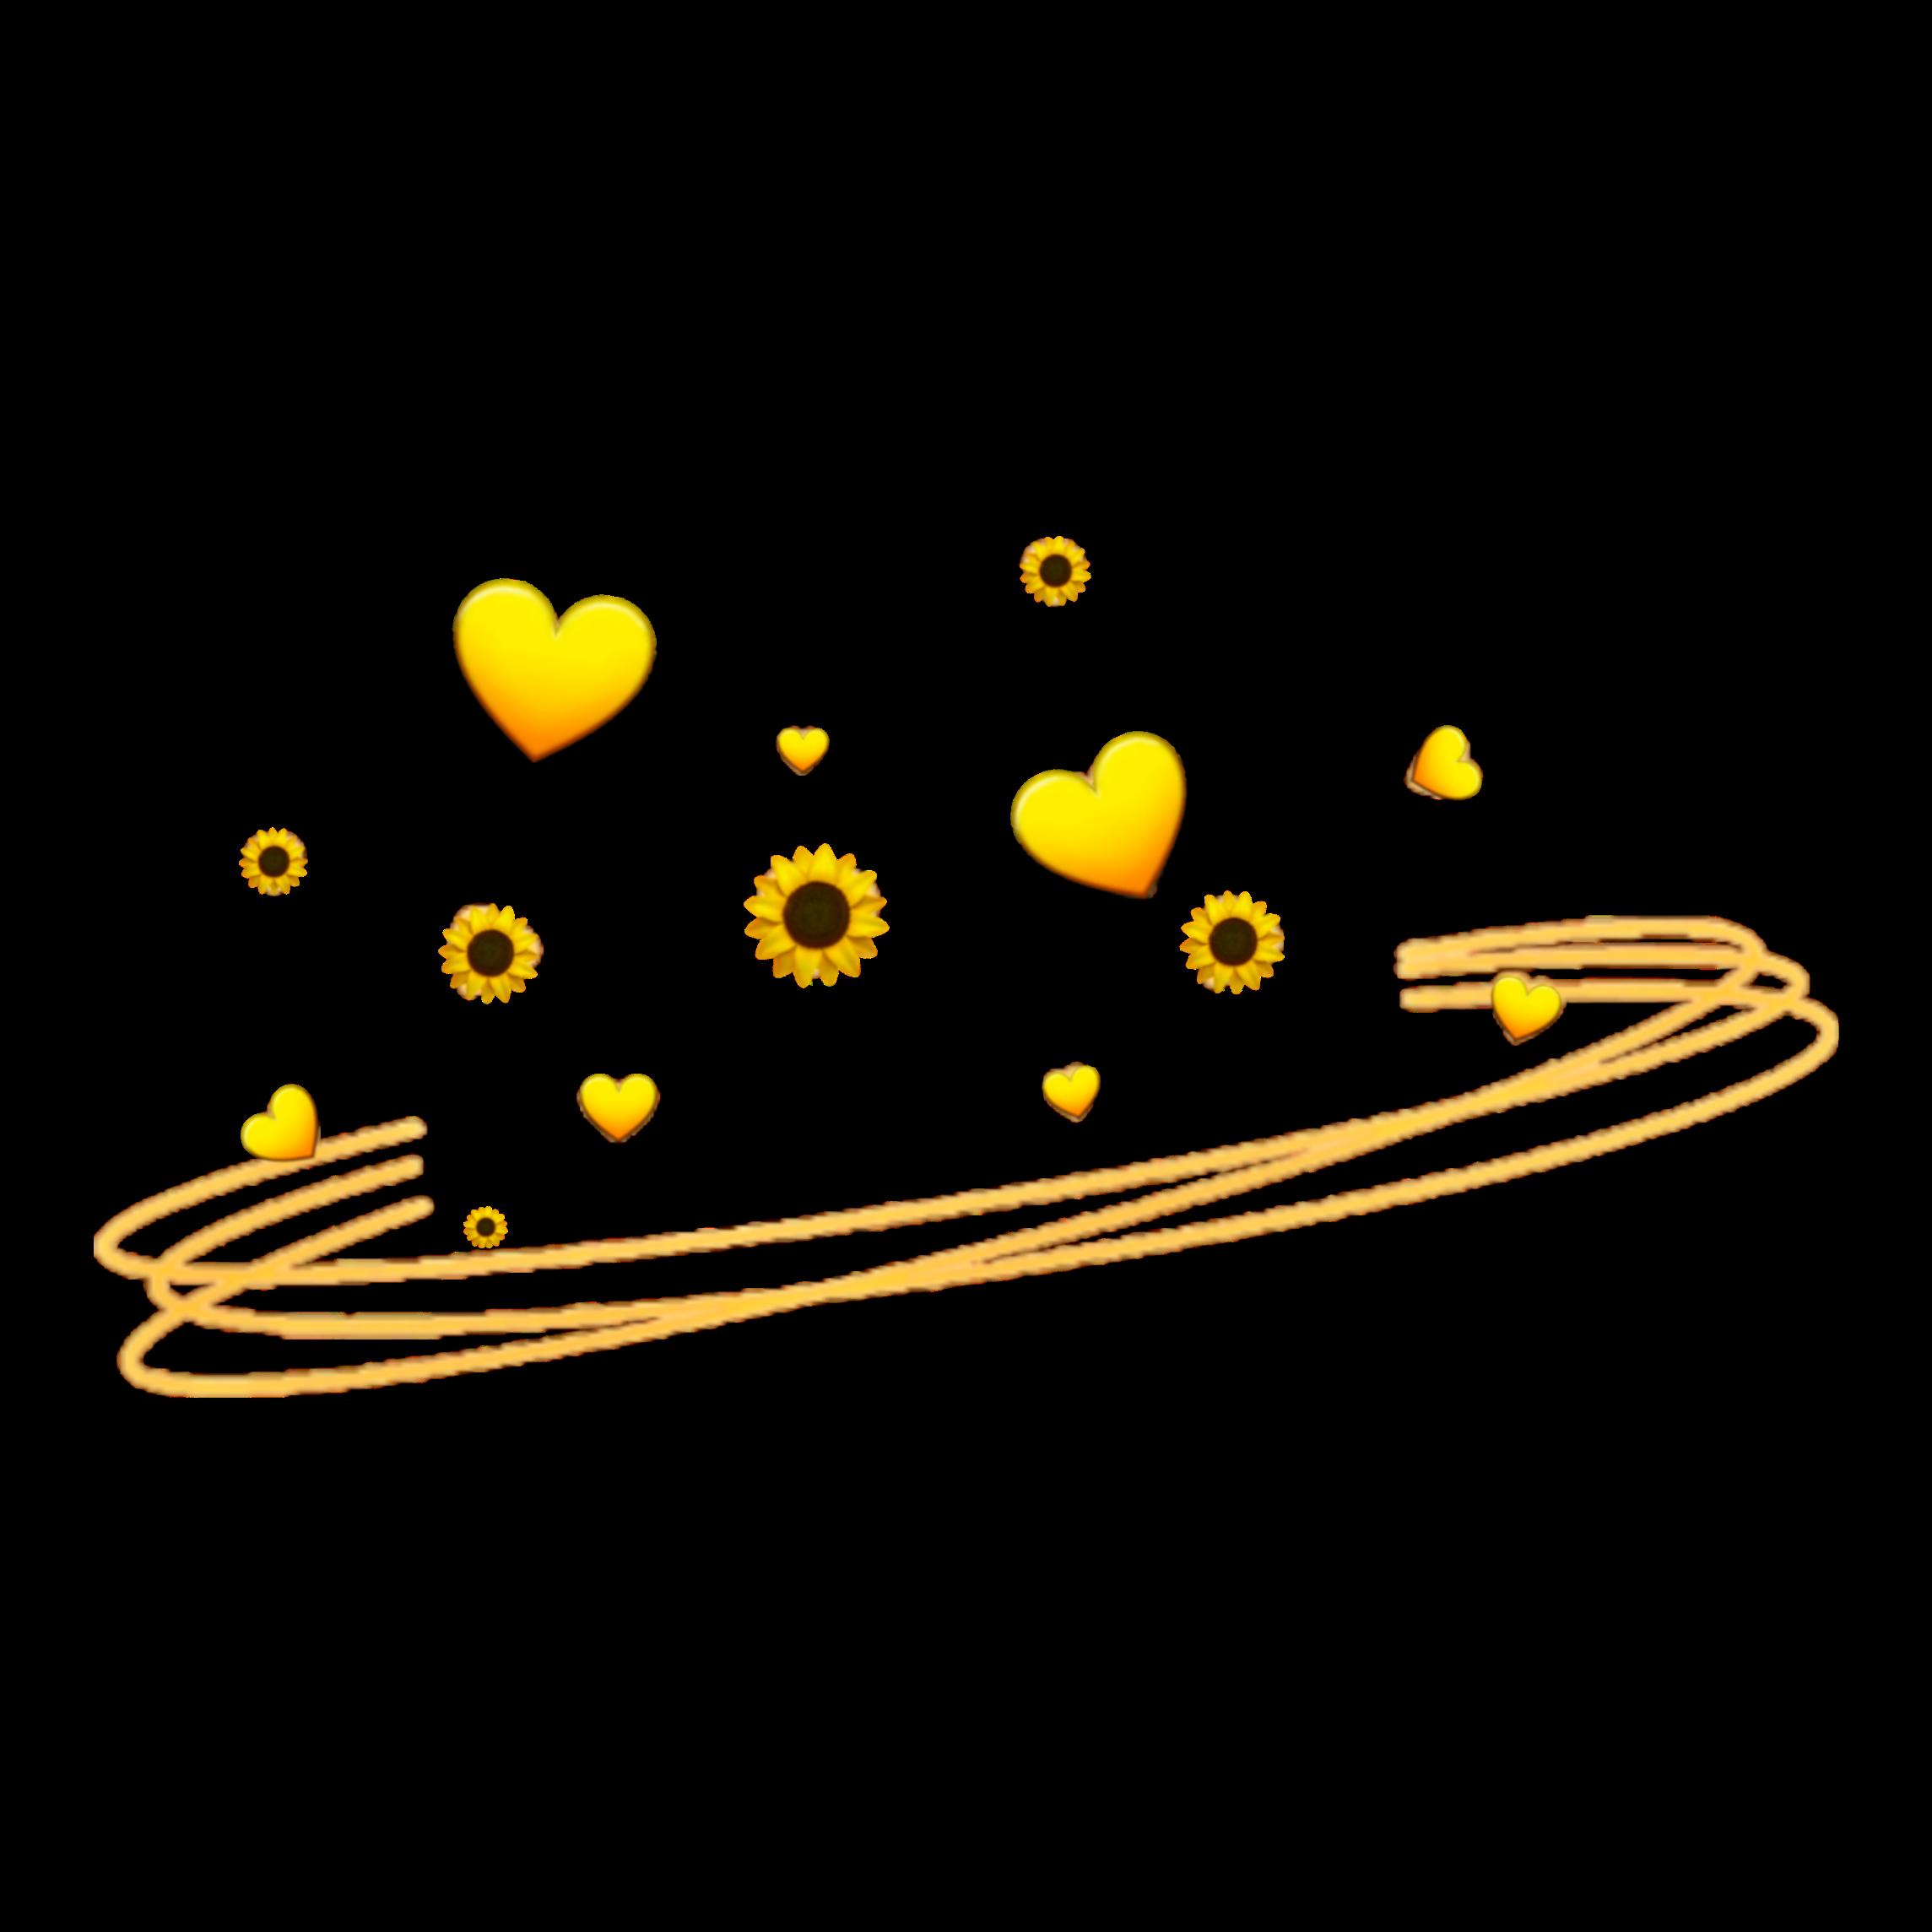 Emoji Whatsapp Sunflower Crown Crownflower Emojicrown Heartemoji Heart Yellow Freetoedit Remixed From Th Emoji Flower Anime Flower Emoji Wallpaper